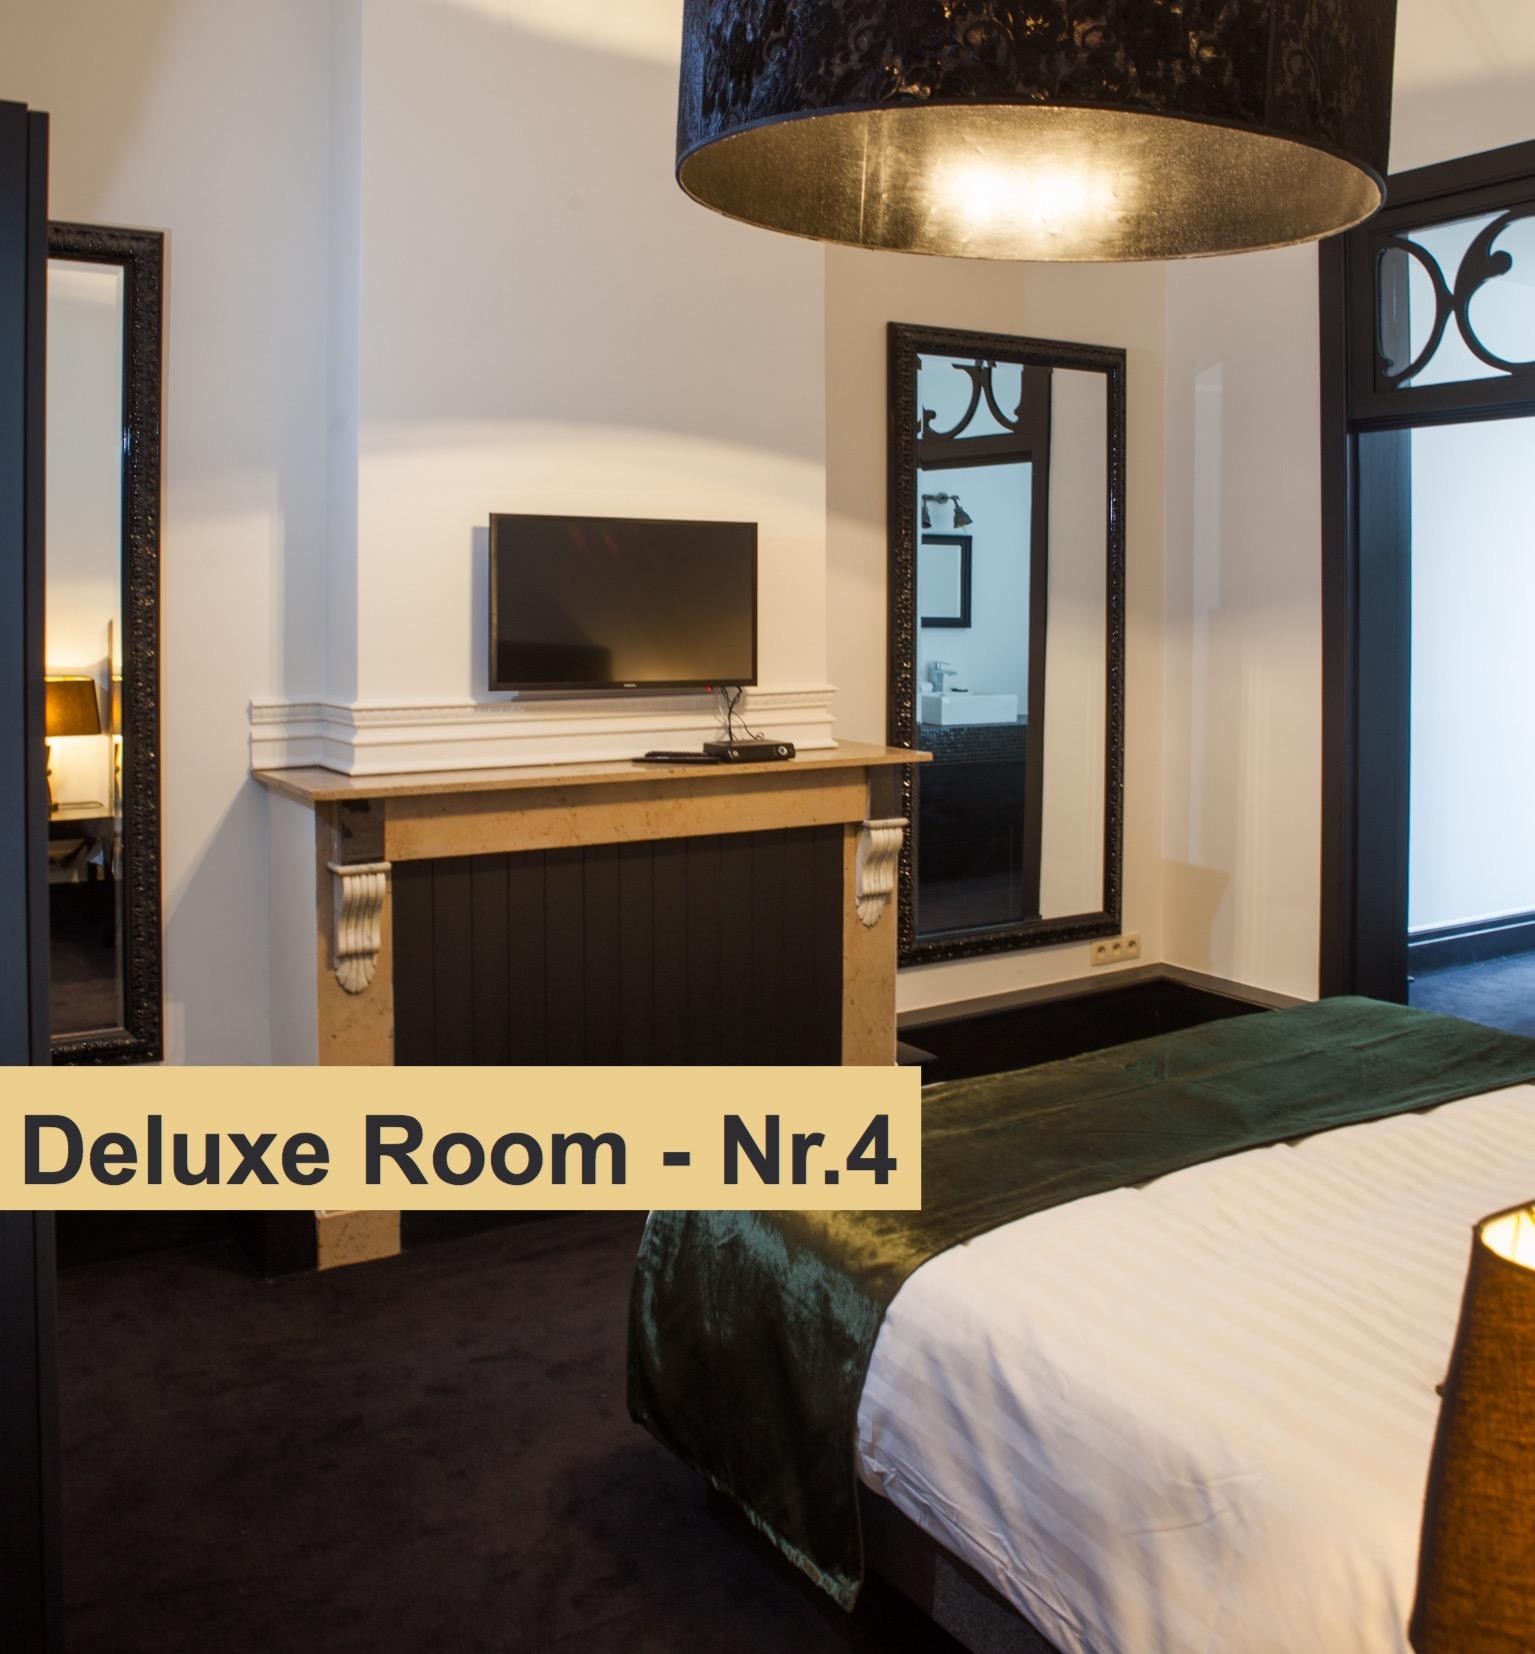 Deluxe Room - Nr.4